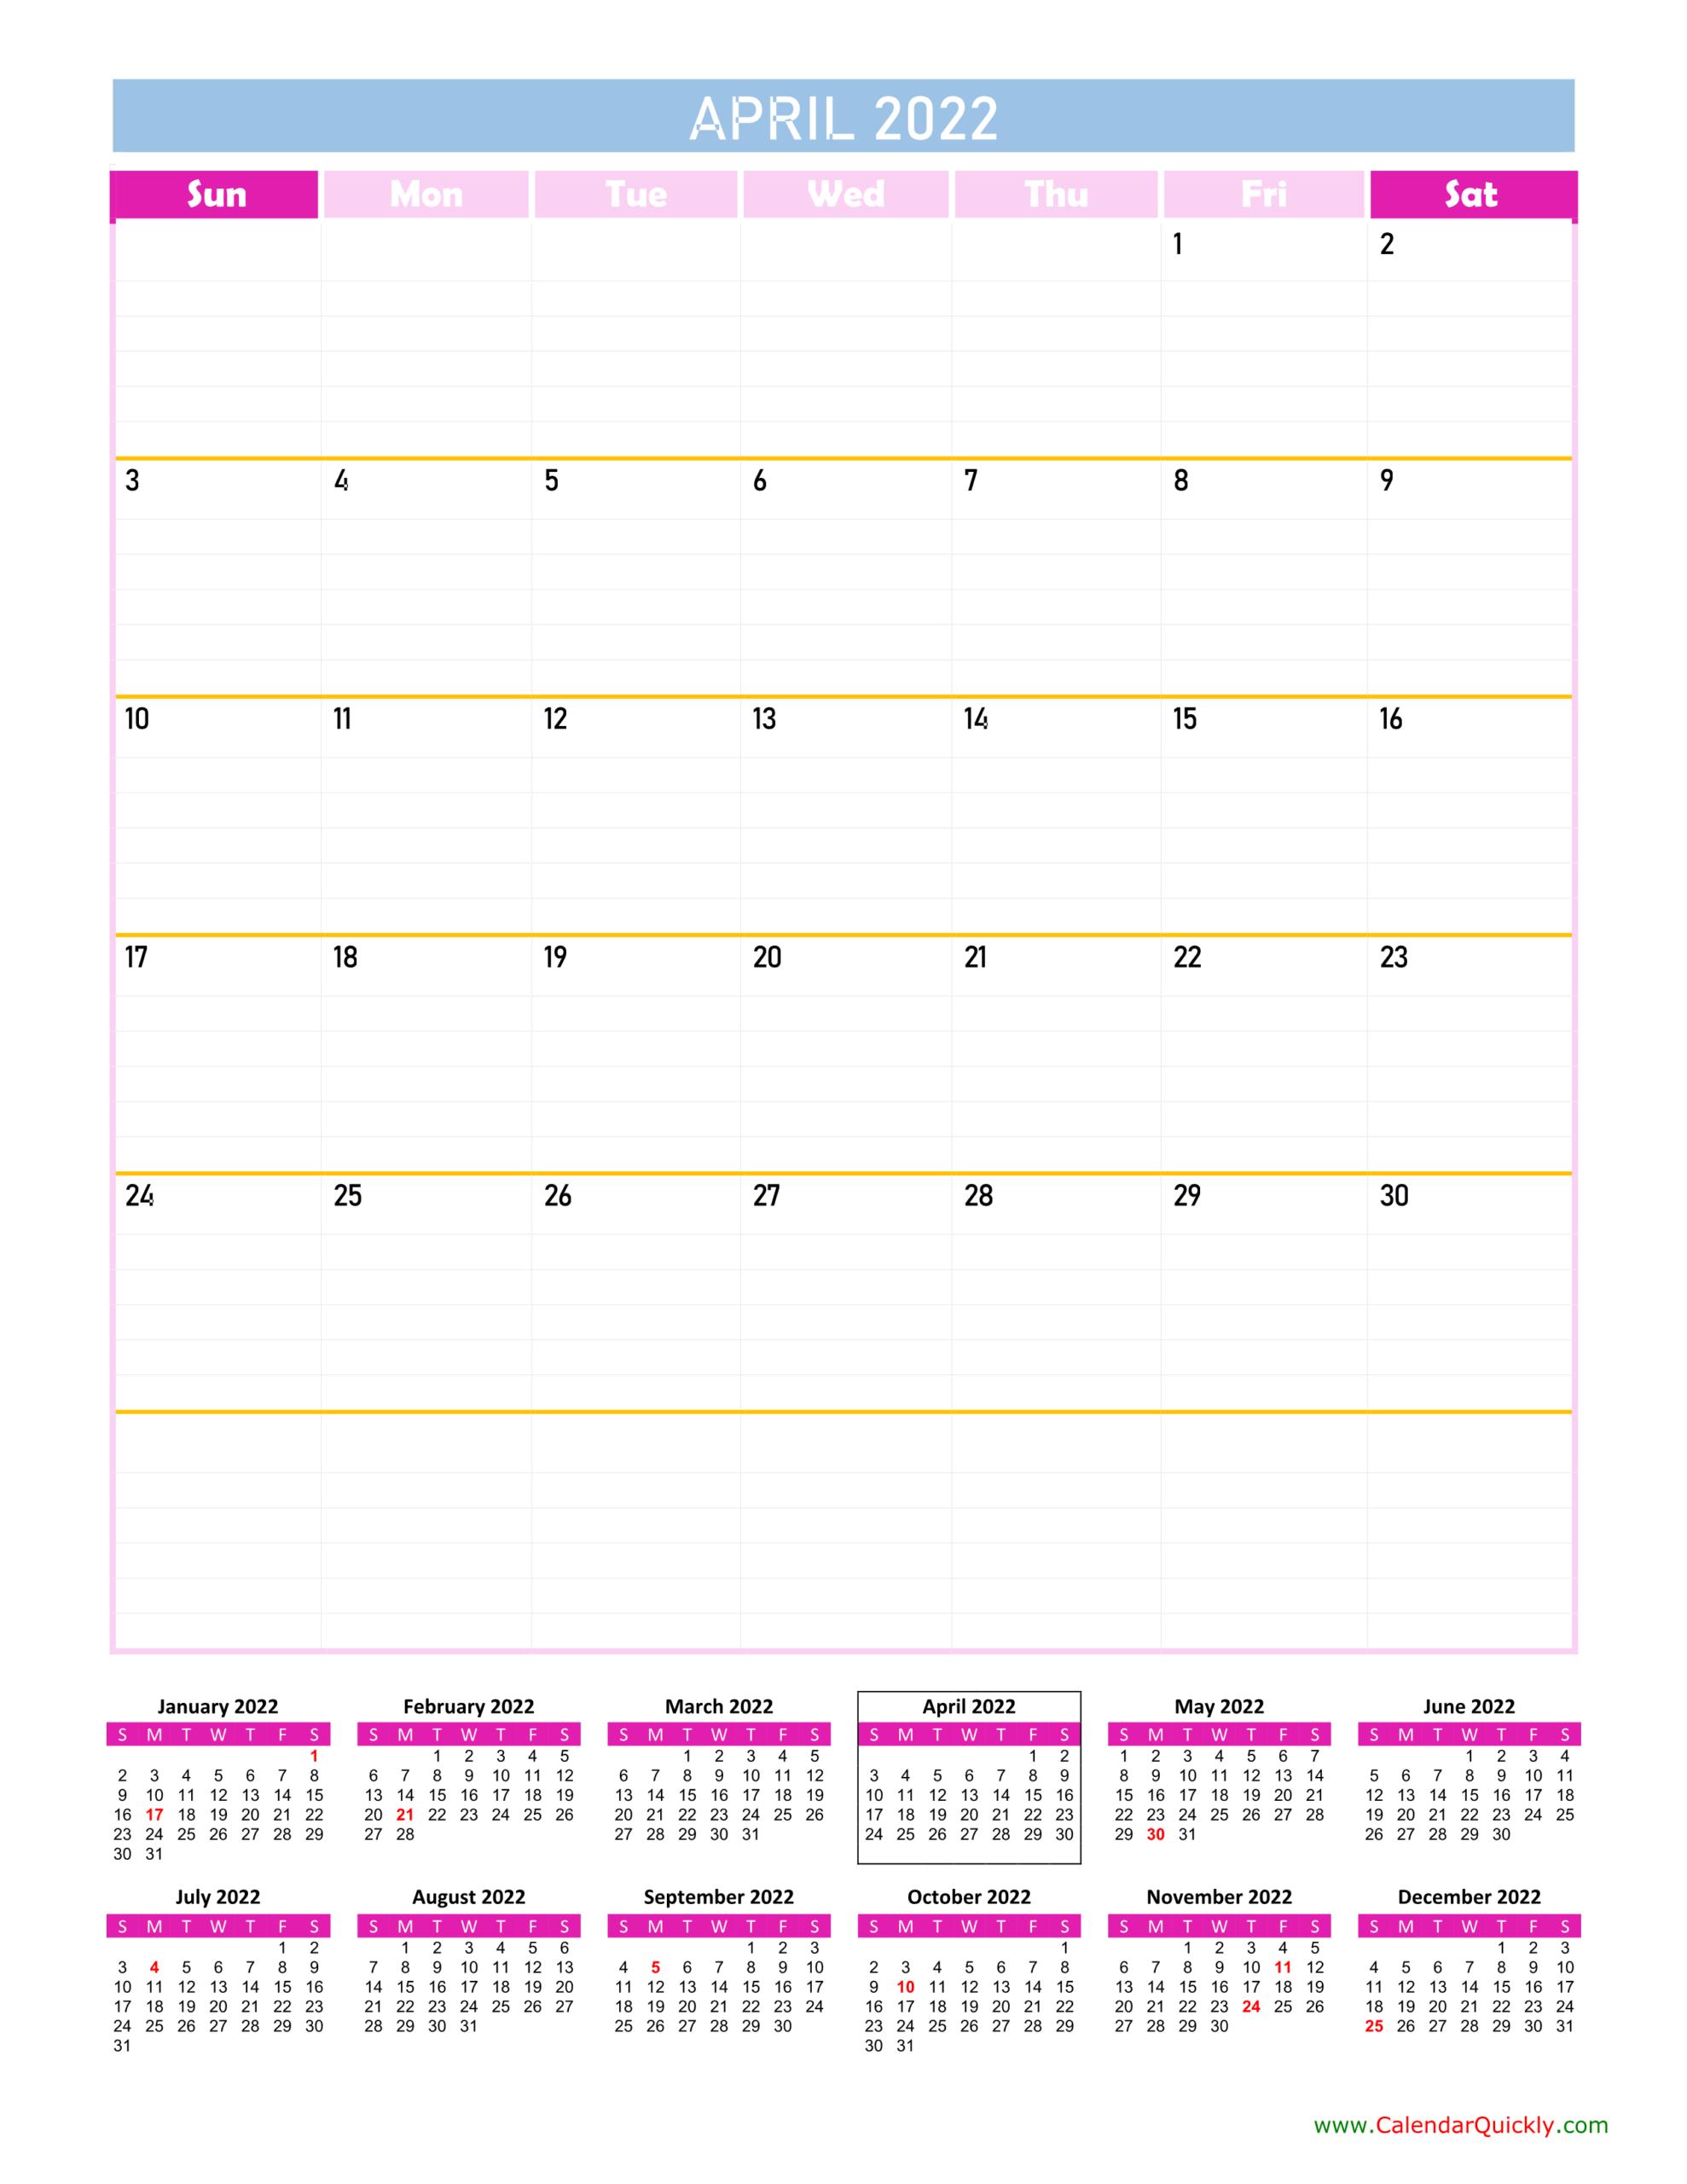 April Calendar 2022 Vertical | Calendar Quickly intended for April May Calendar 2022 Photo